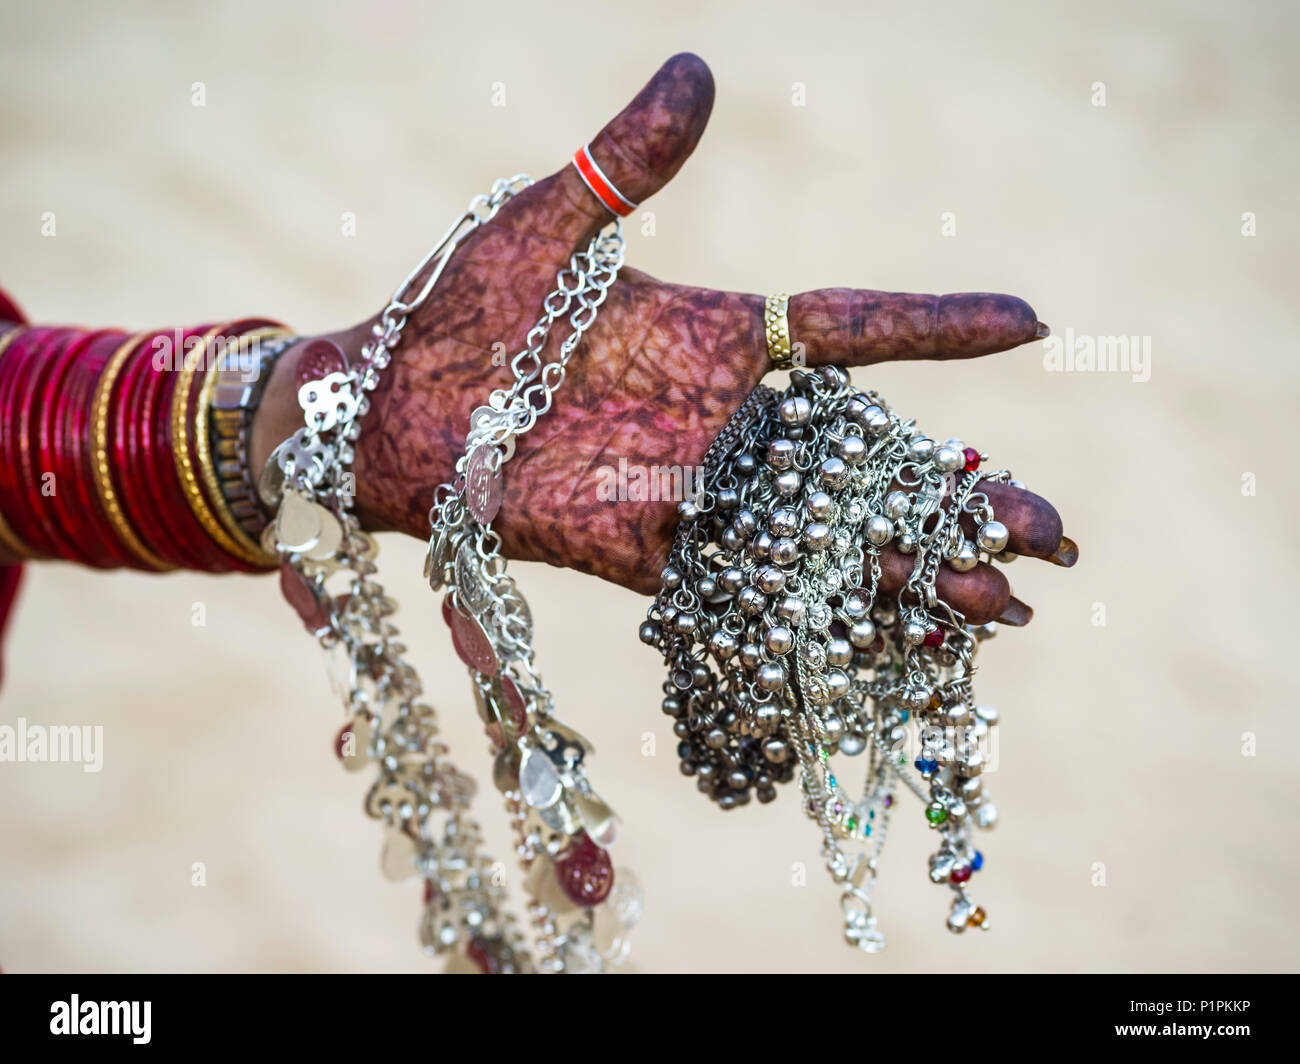 La main d'une femme couverte de henna body art et holding Silver jewelry, Jaisalmer, Rajasthan, India Photo Stock